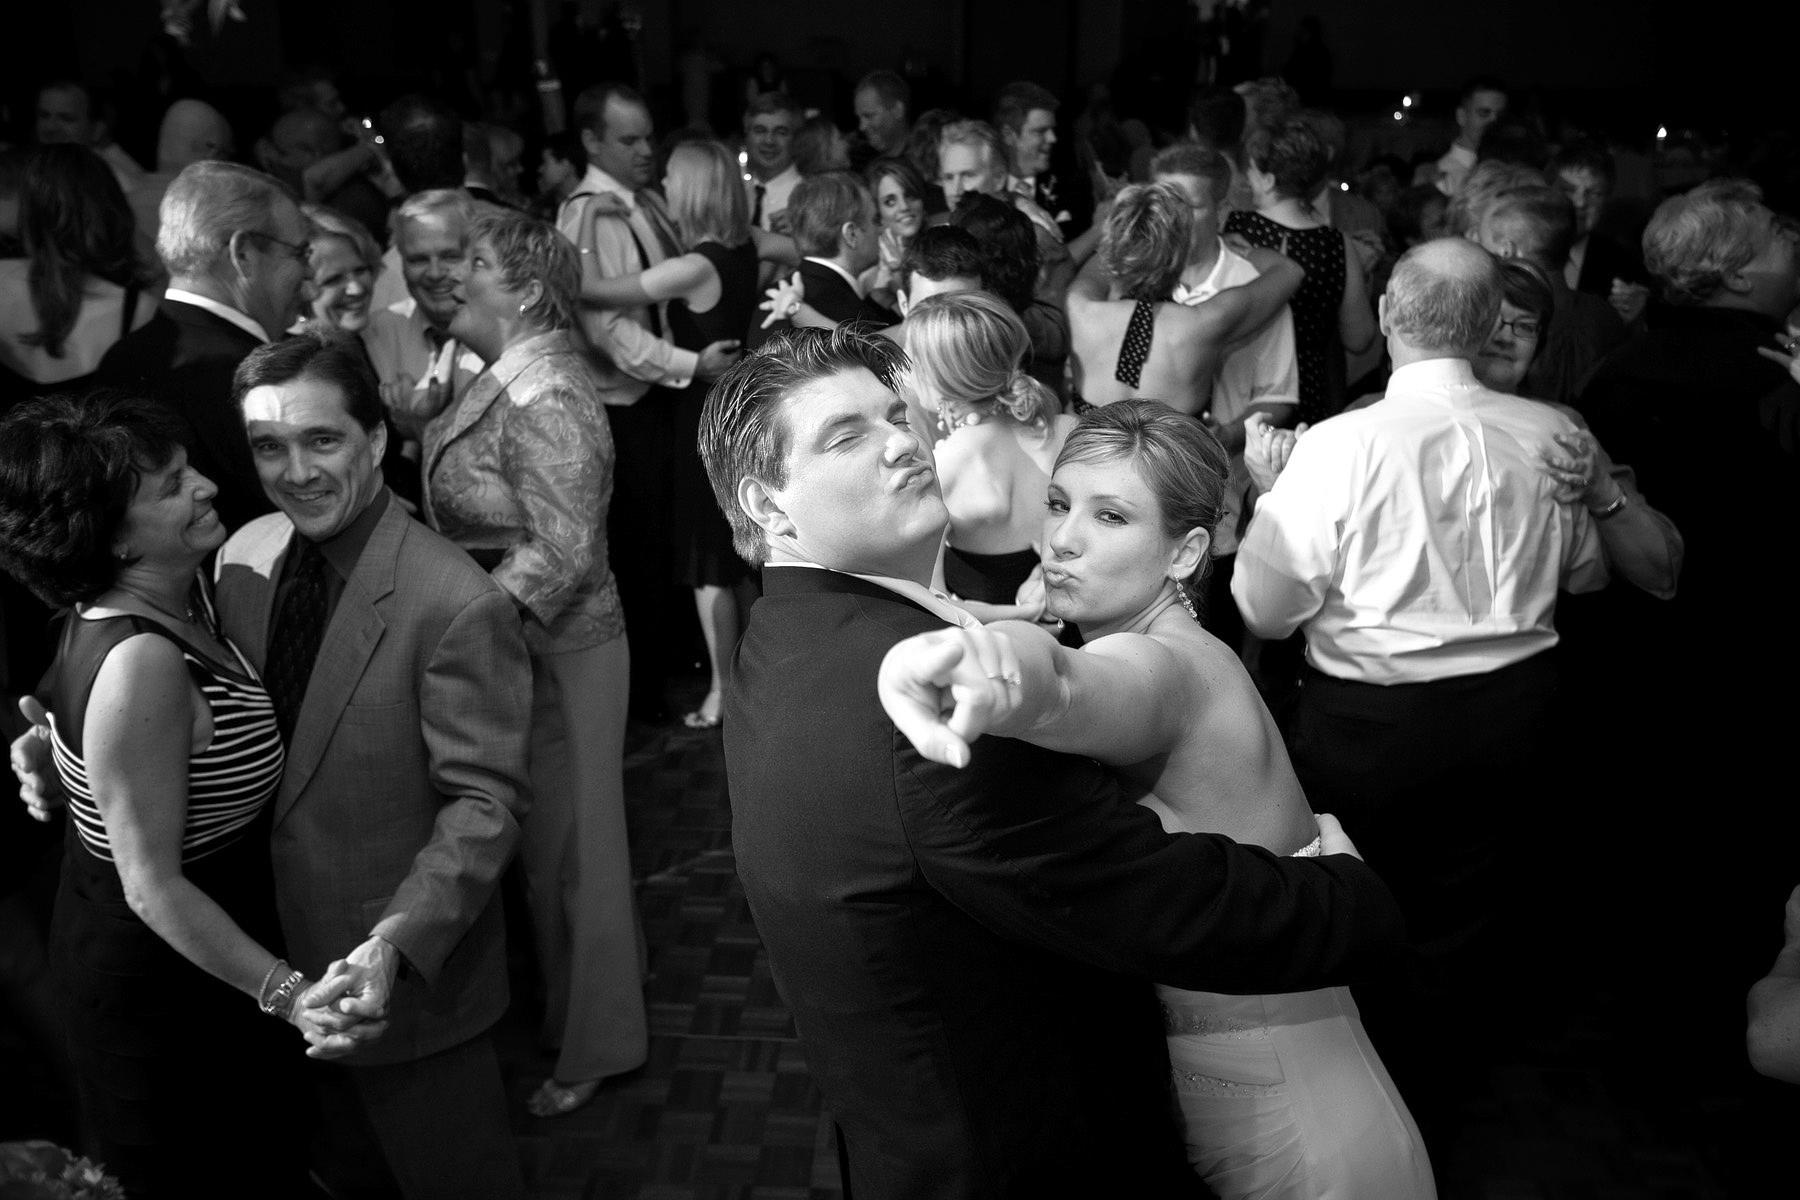 wedding-photography-saint-paul-mark-kegans-631.jpg